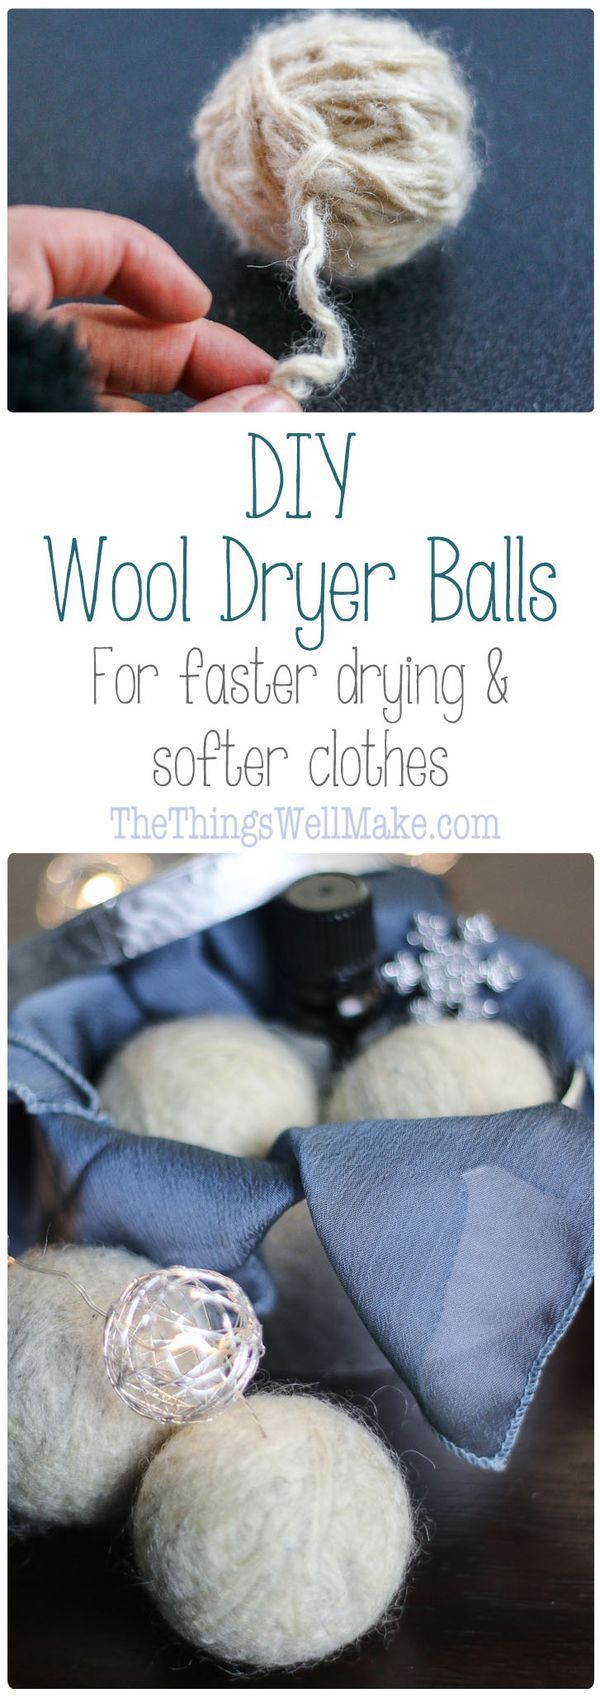 25 Best Ideas About Dryer Balls On Pinterest Wool Dryer